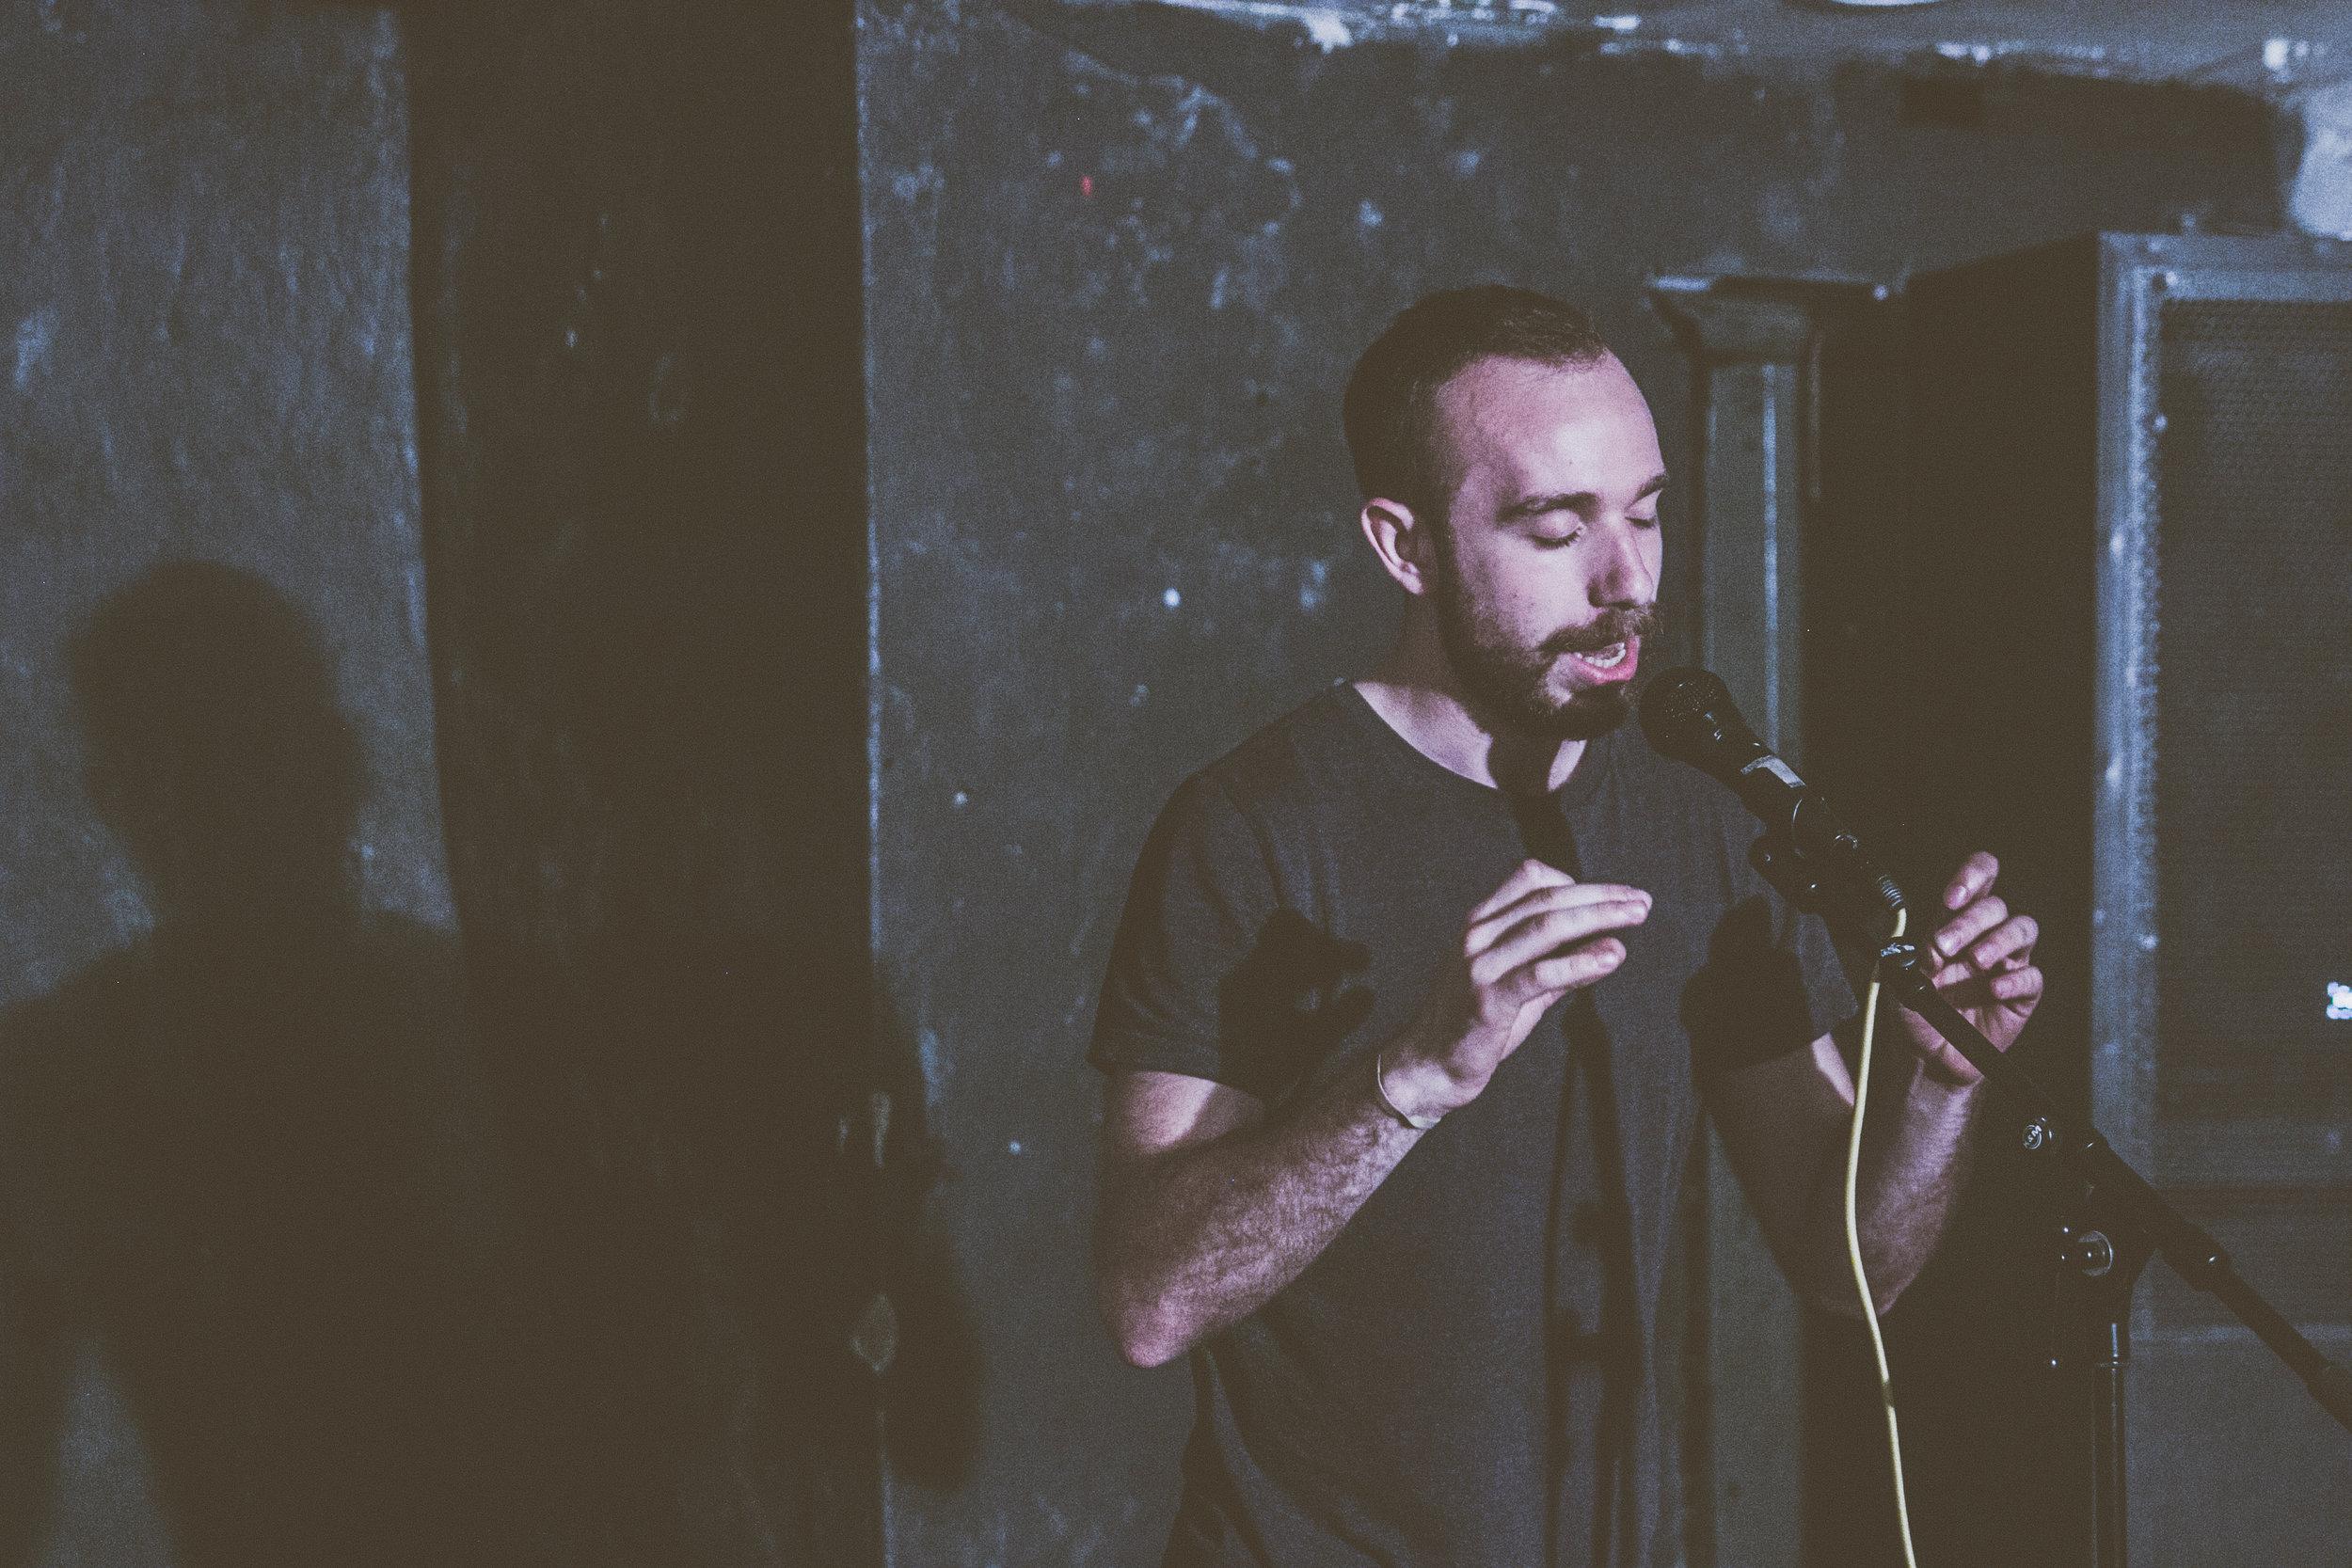 05.07.2017 - Spoken Word London - Dalston - Ant Adams Photo-8.jpg